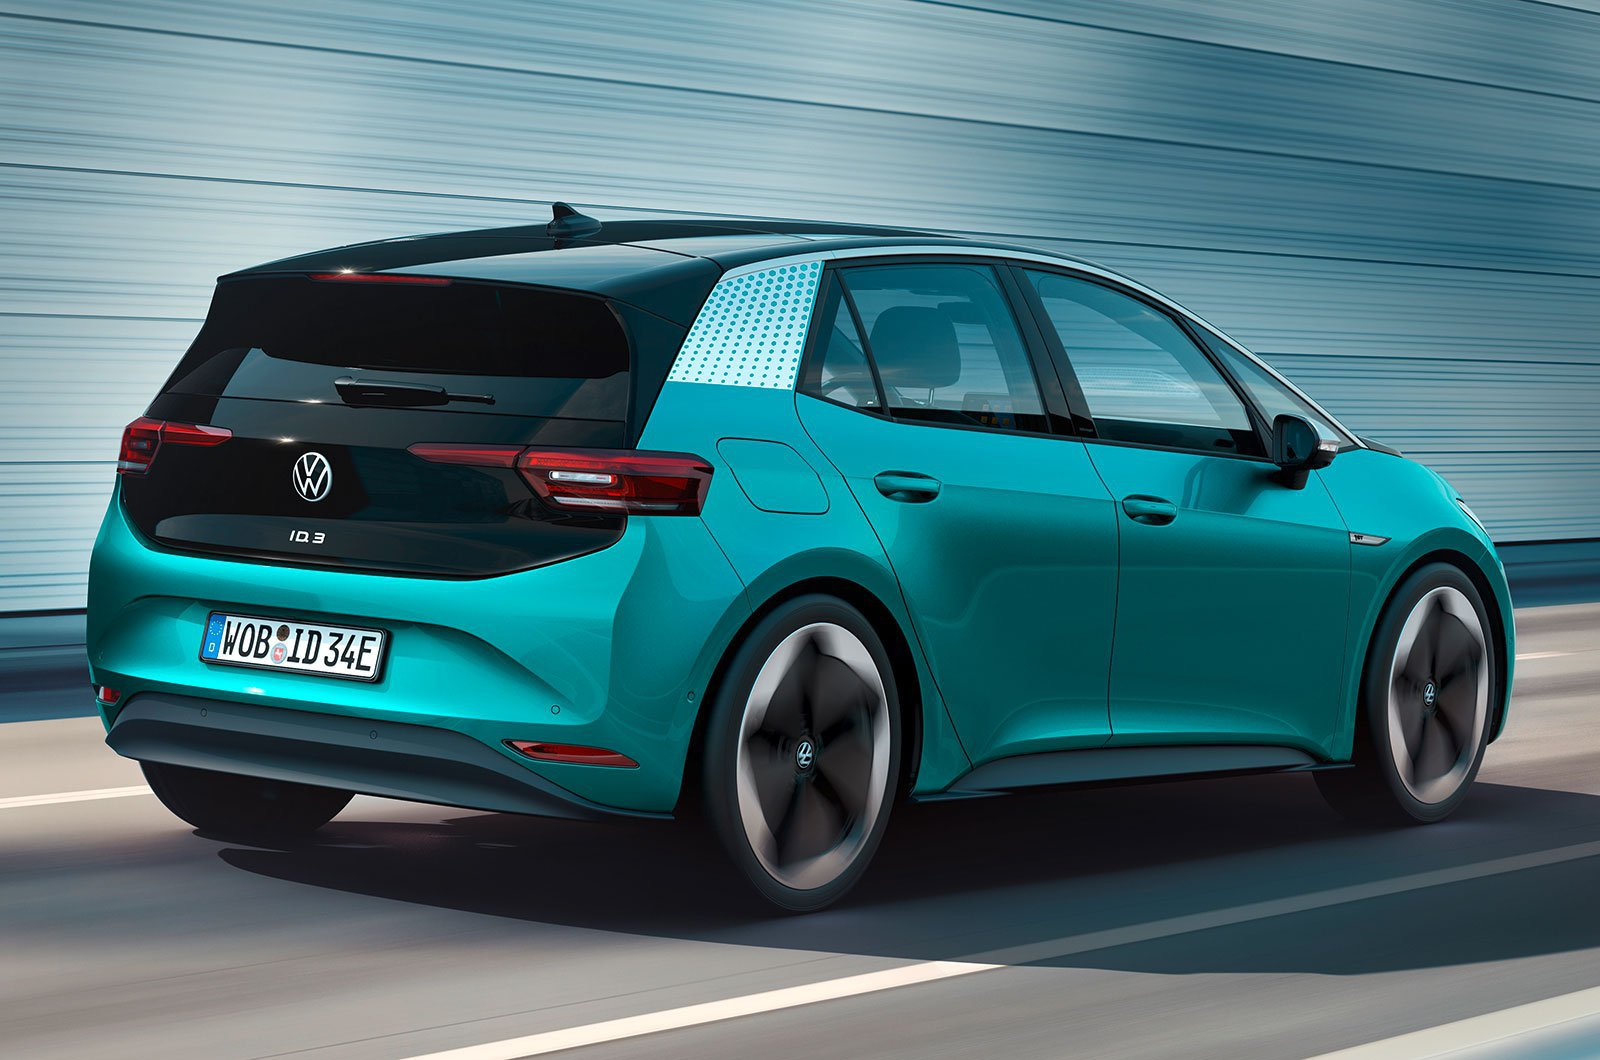 Volkswagen ID 3: continued